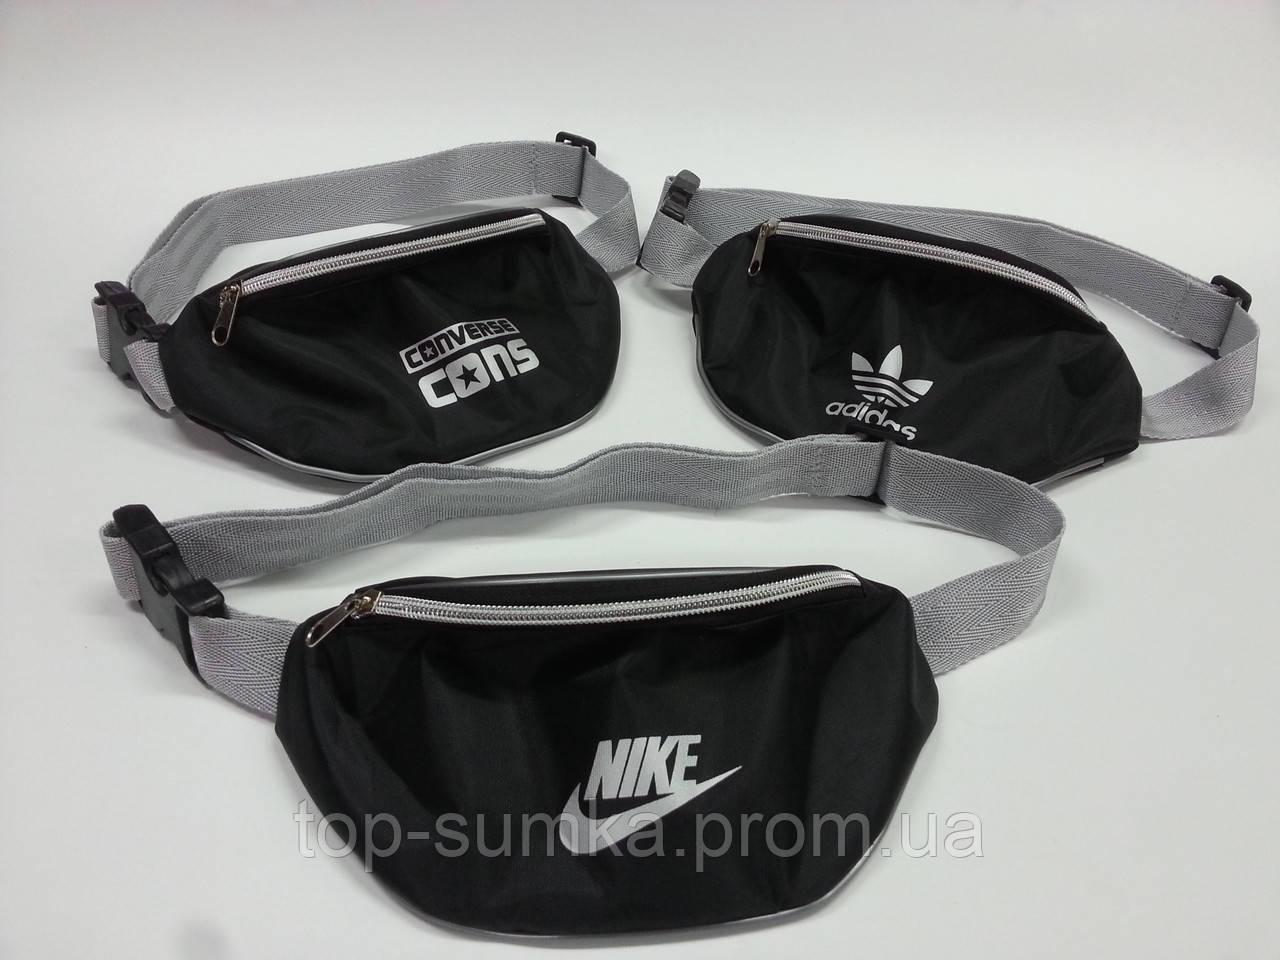 2ef747bc Поясная сумка Converse ,Nike , Adidas (бананка) , черный/серый -